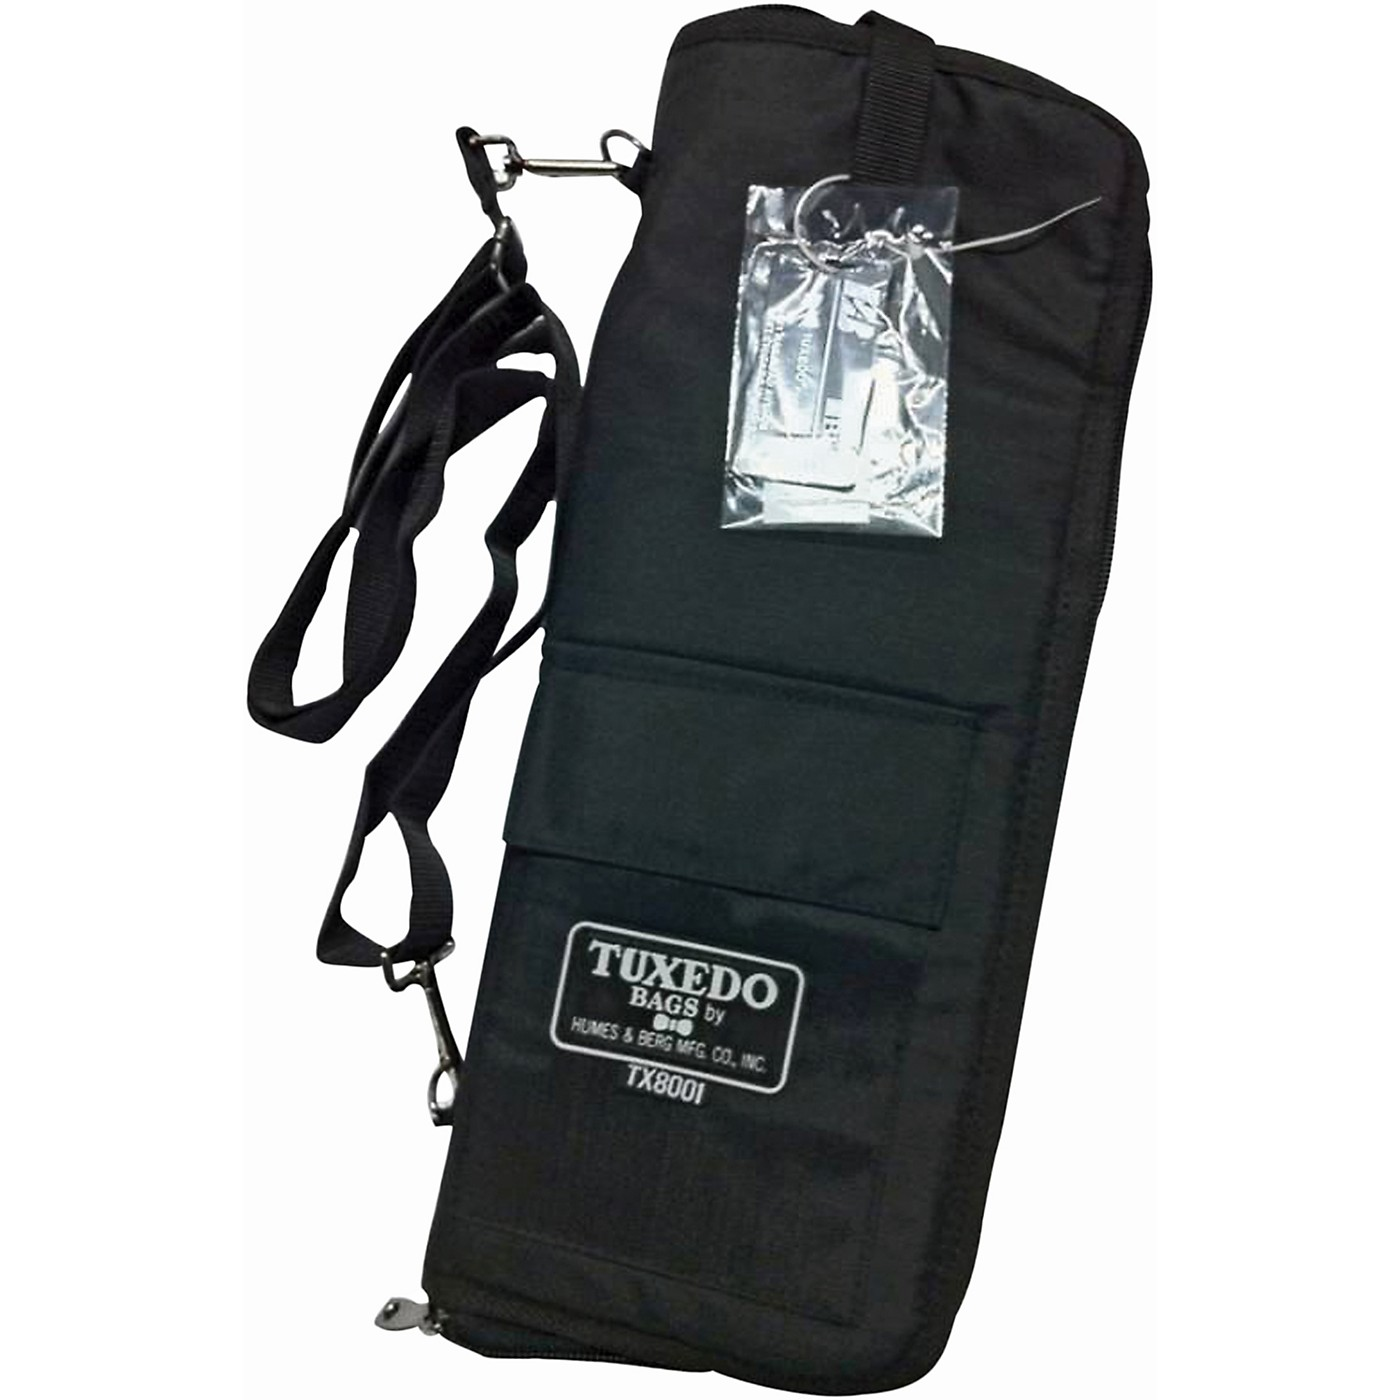 Humes & Berg Tuxedo Stick Bag with Shoulder Strap thumbnail